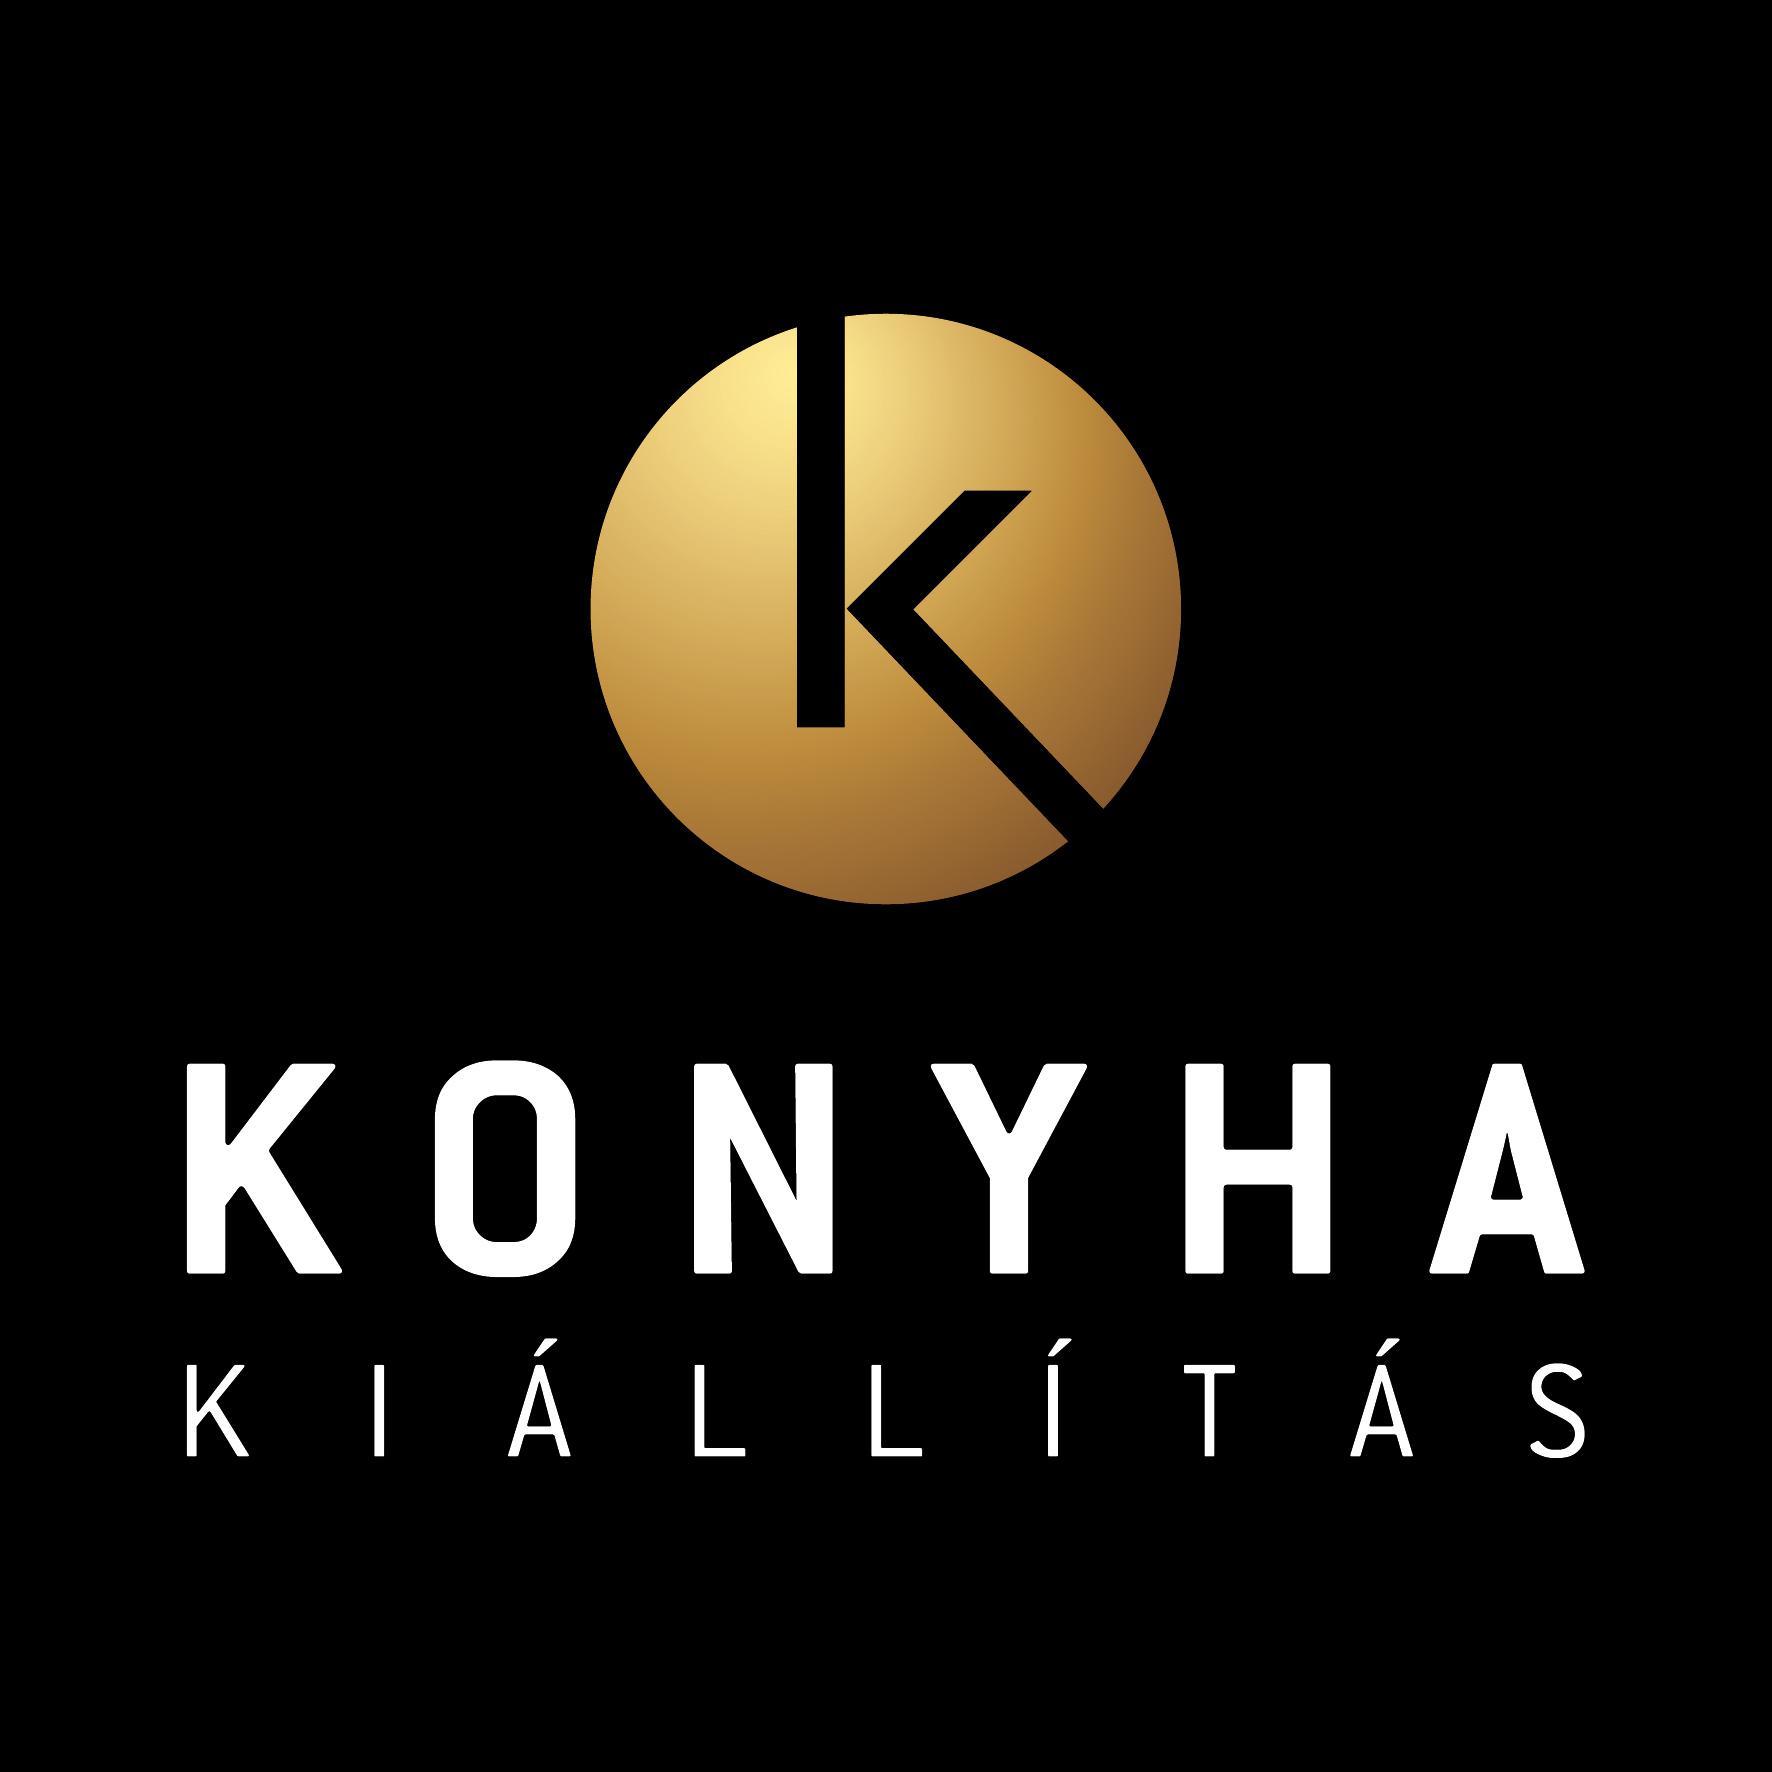 kk_logo_2012_rgb_mid_black_base.jpg